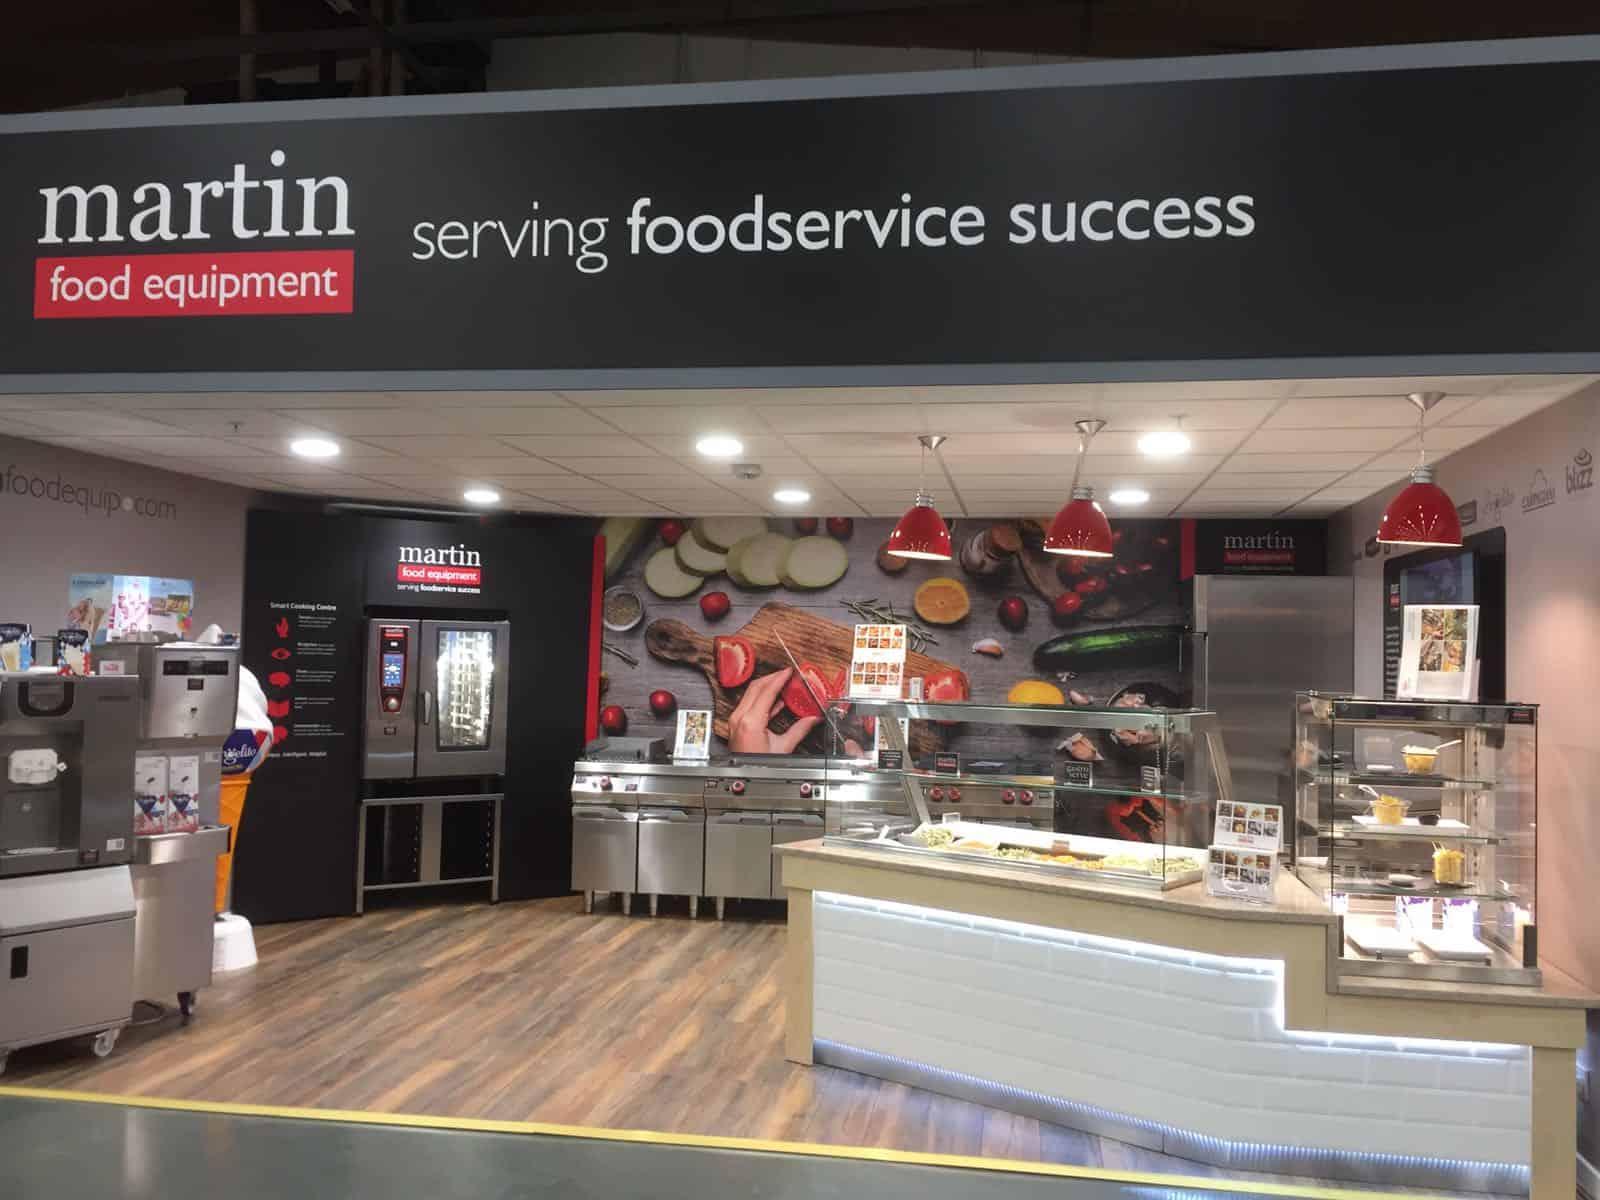 Martin Food Equipment MFE-Musgrave-Marketplace Martin Food Equipment/Musgrave MarketPlace Partnership News